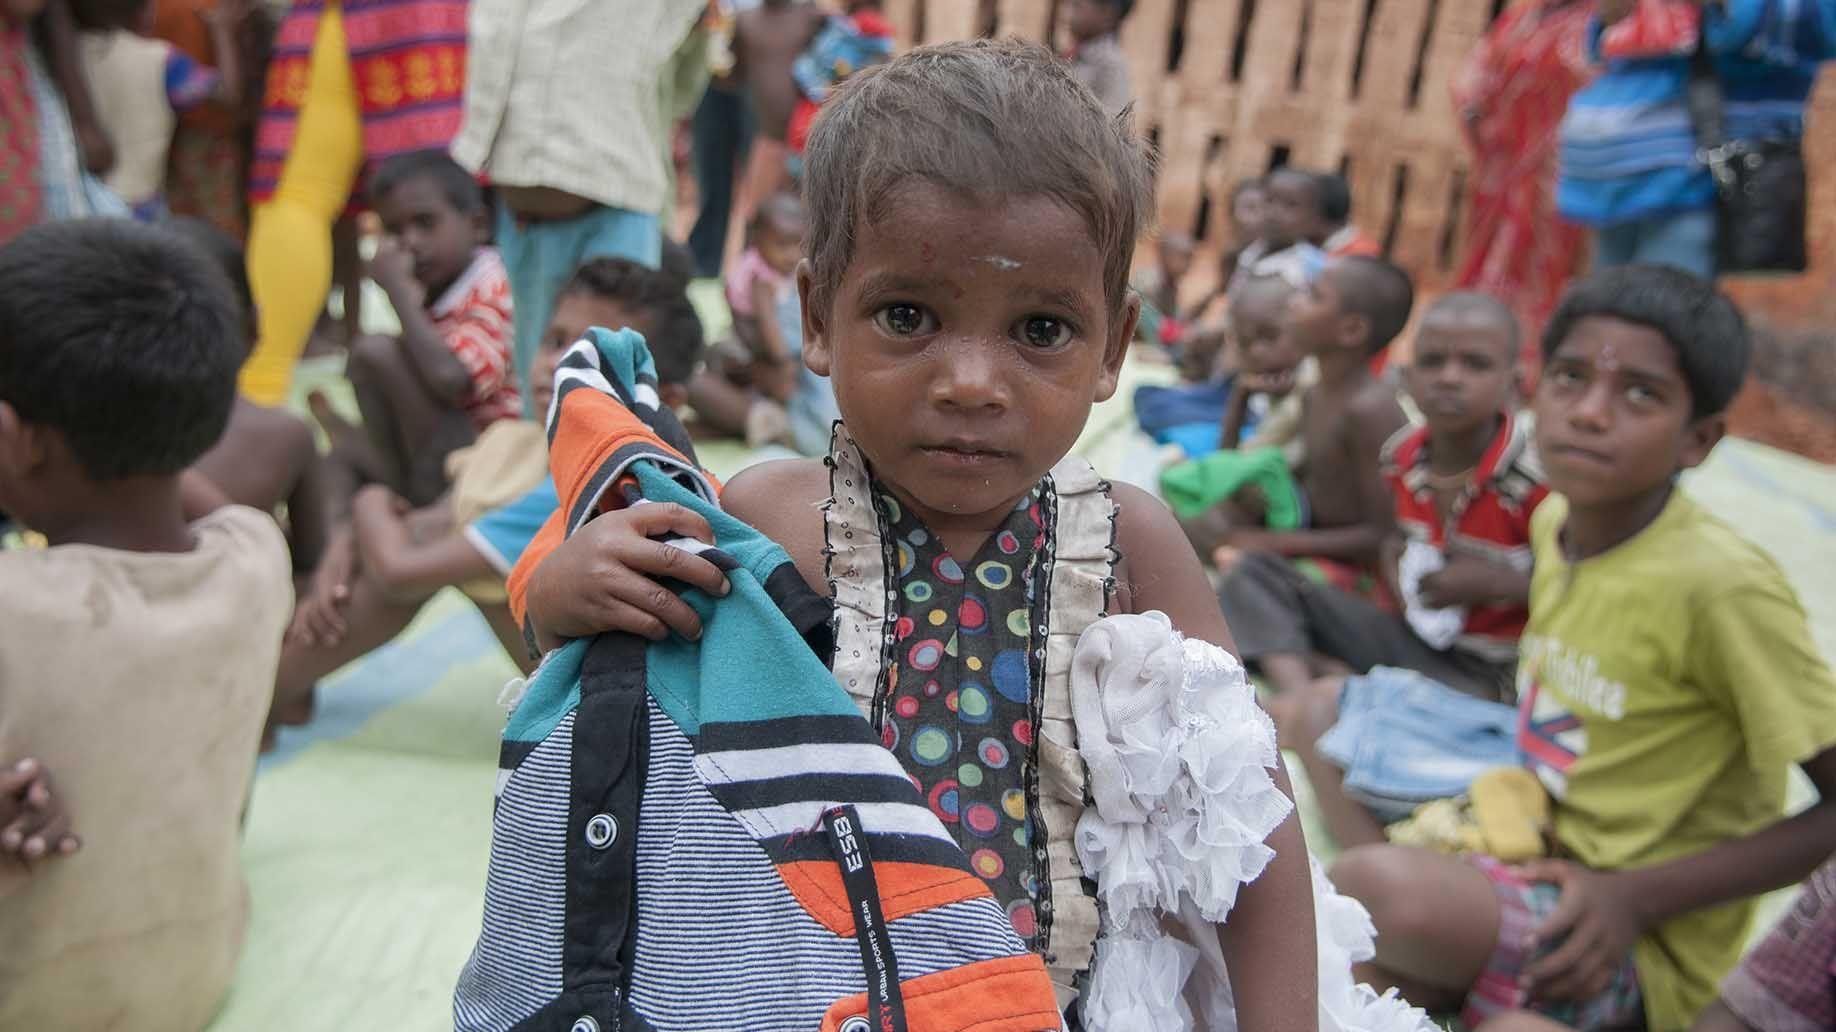 kolkata october 26 a girl child Donate clothes charity